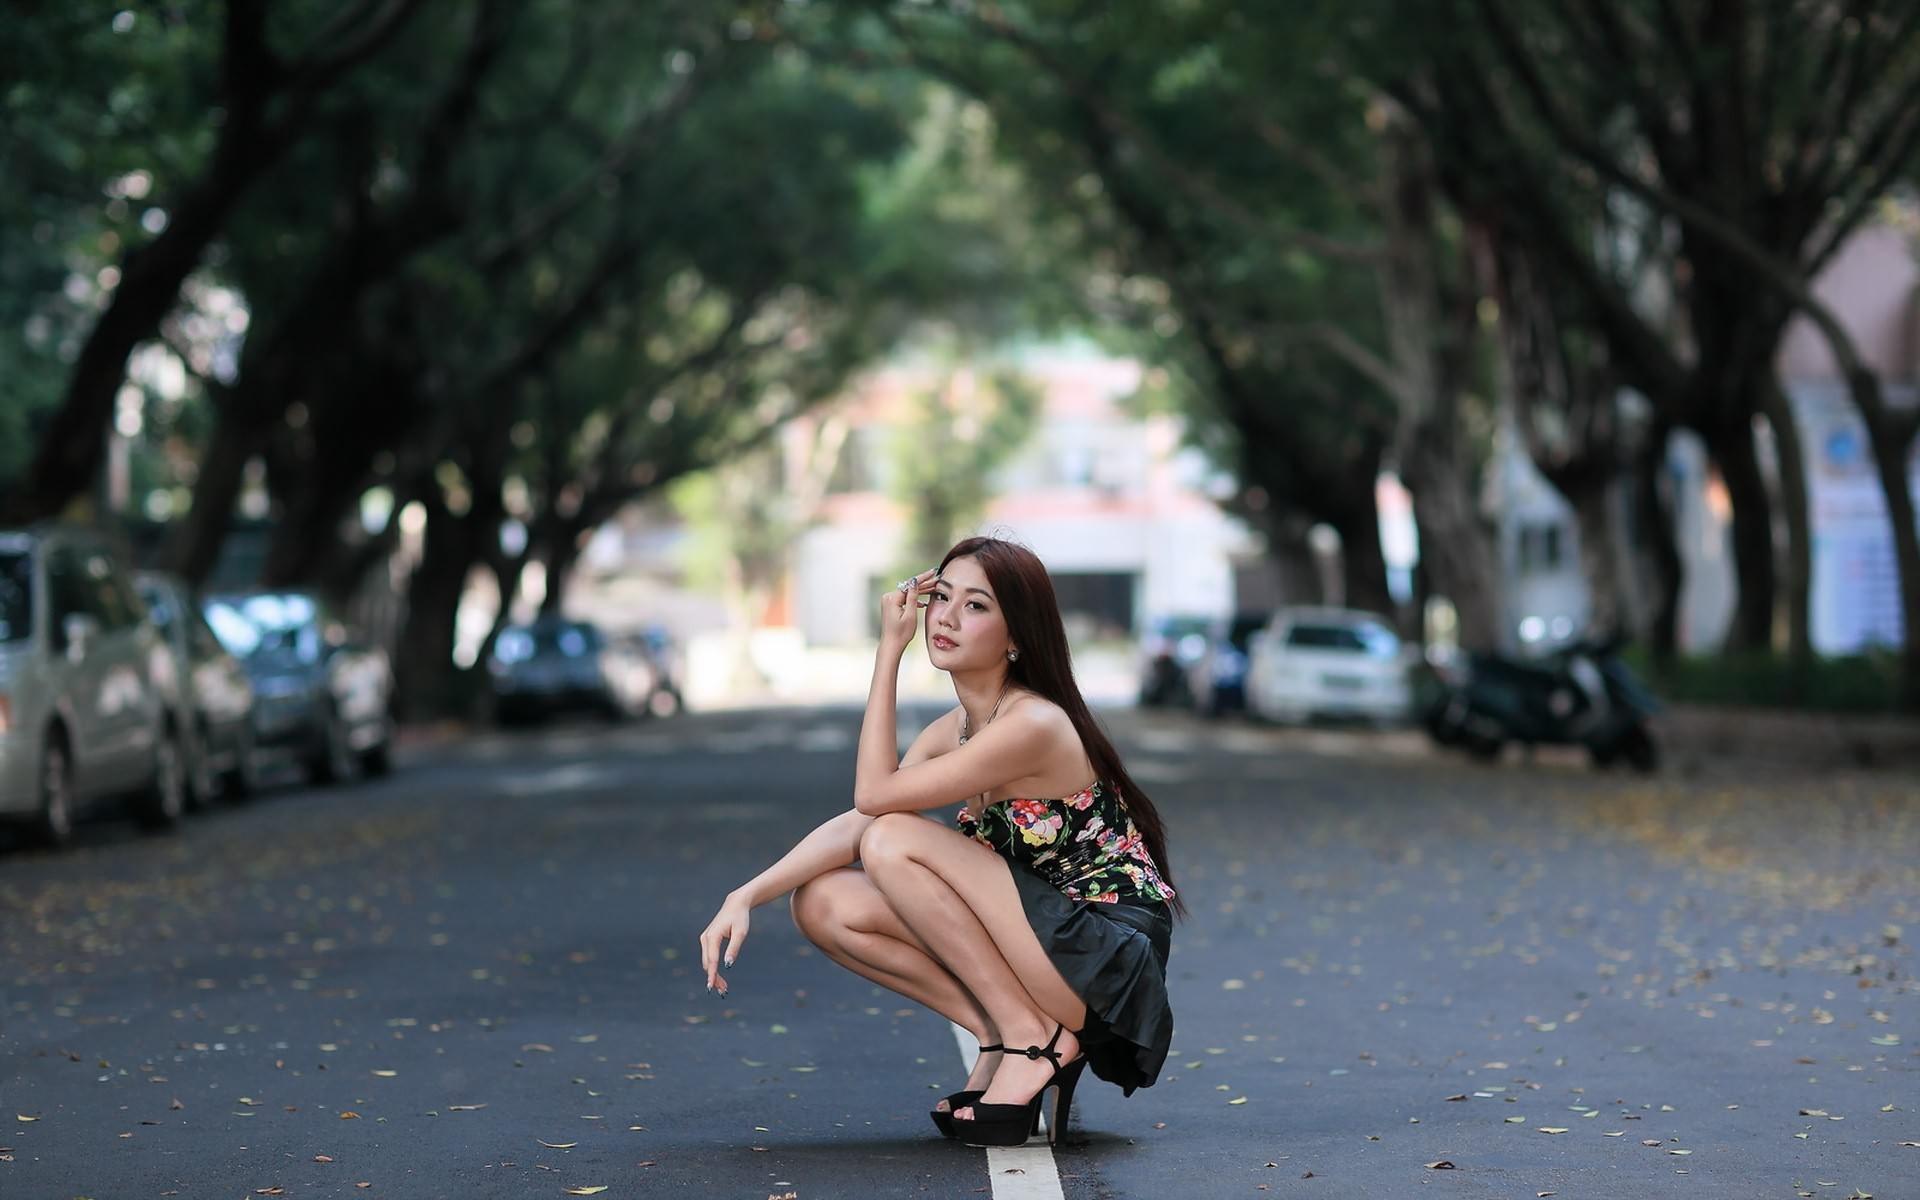 сесть на корточки фото - 5